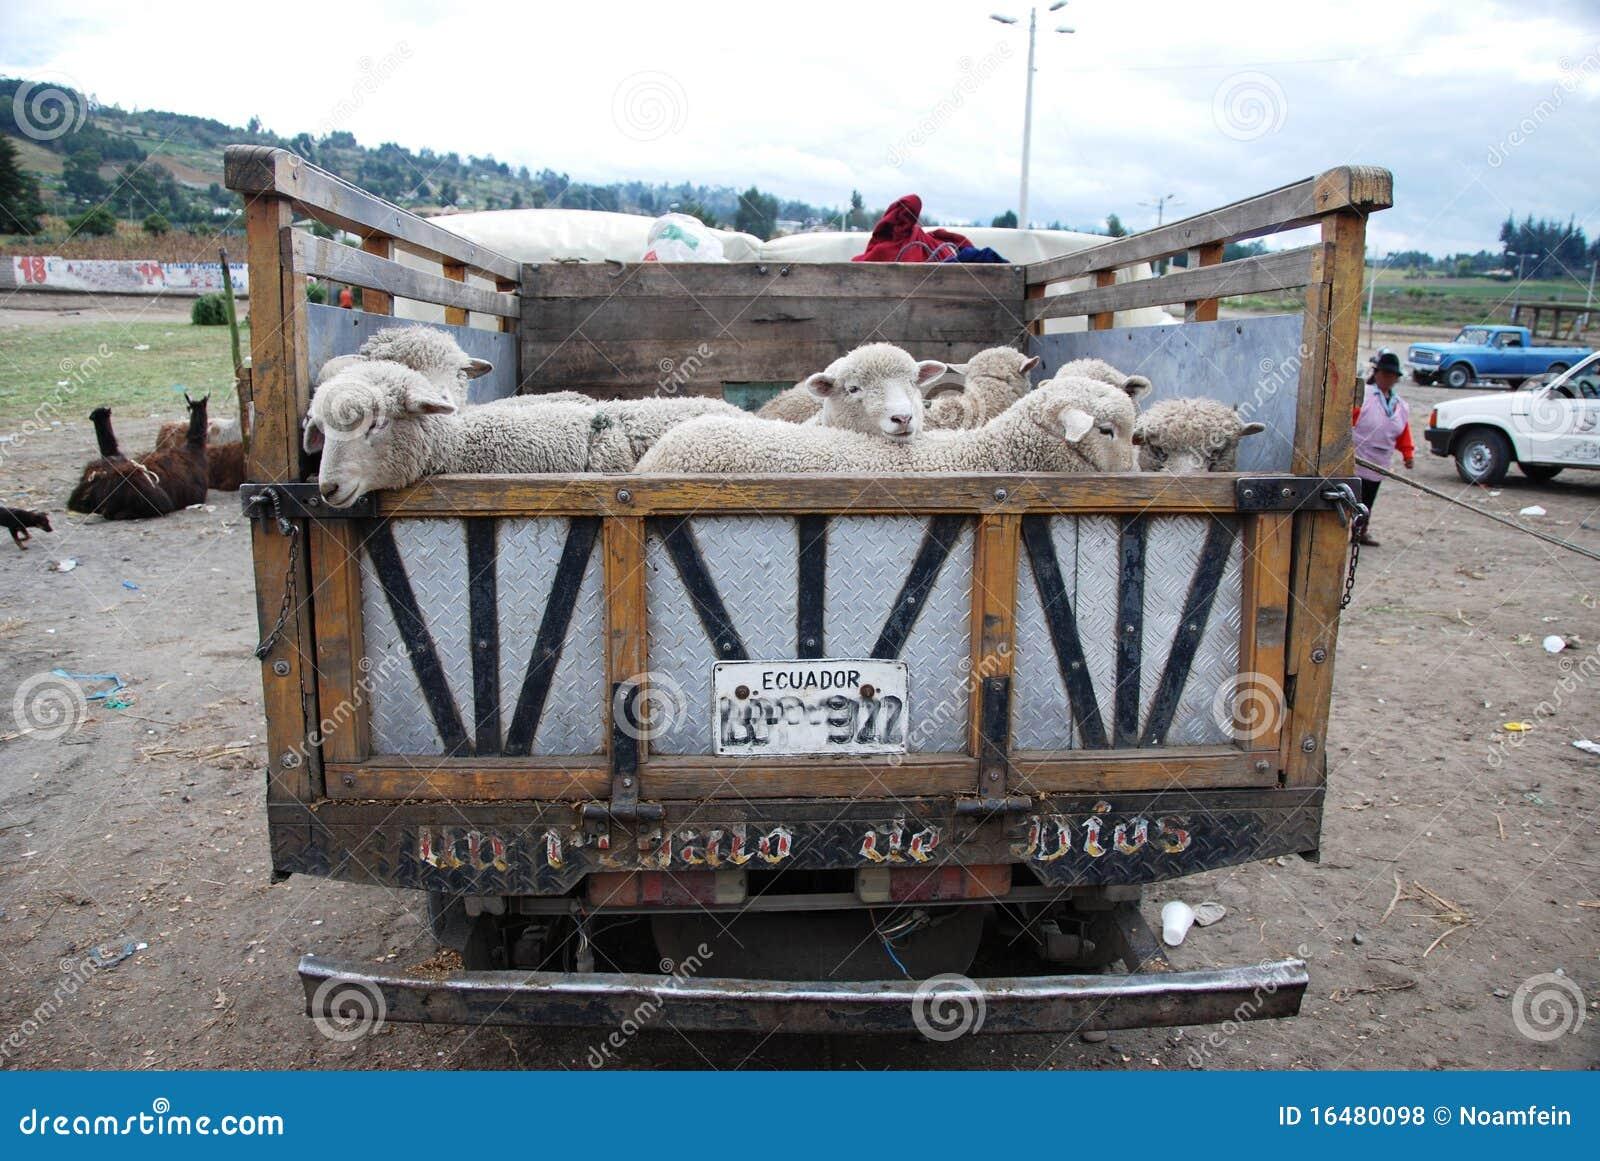 Ecuadorian pełna cakli ciężarówka